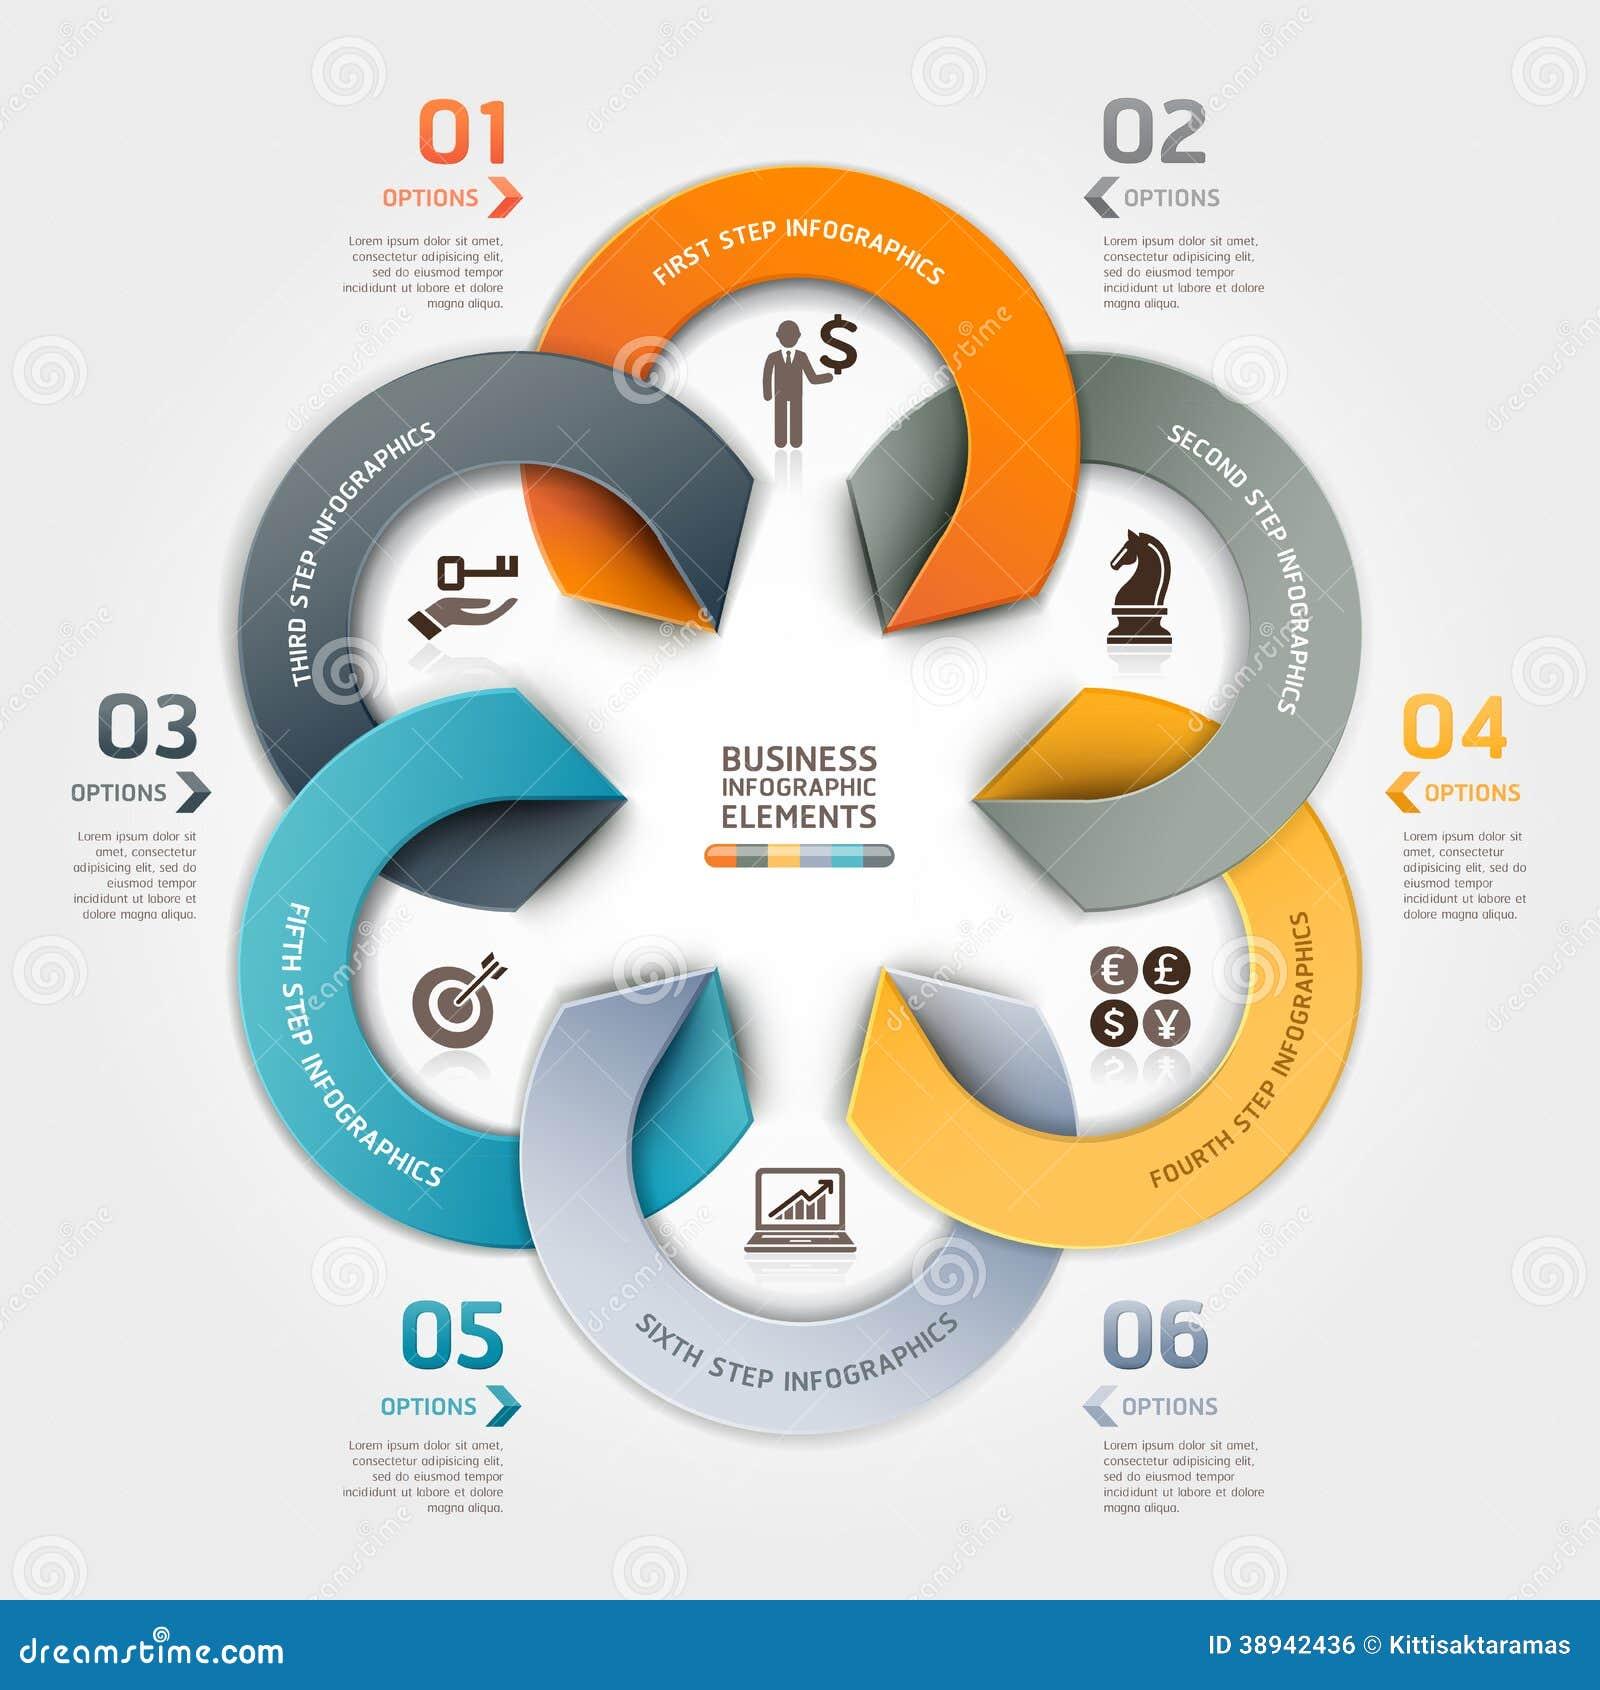 Infographic design styles